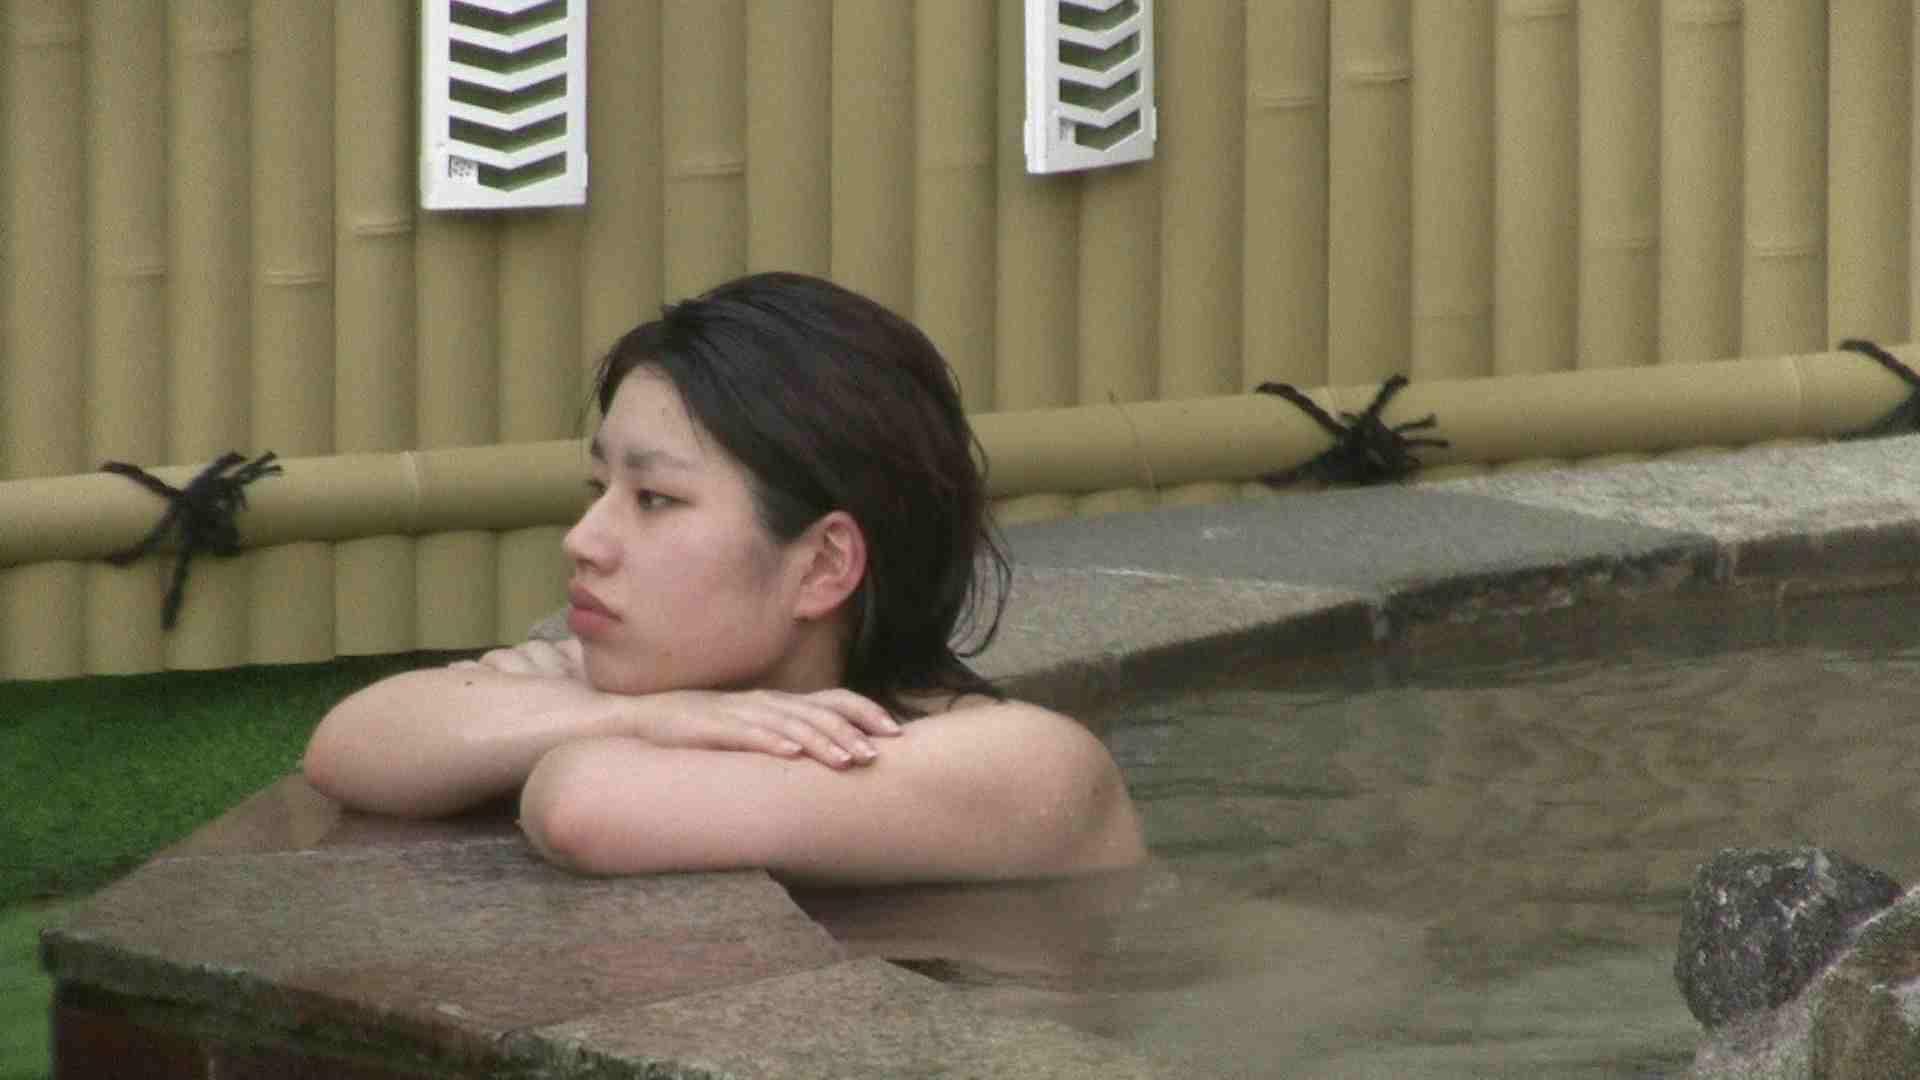 Aquaな露天風呂Vol.230 HなOL | 盗撮  83pic 16